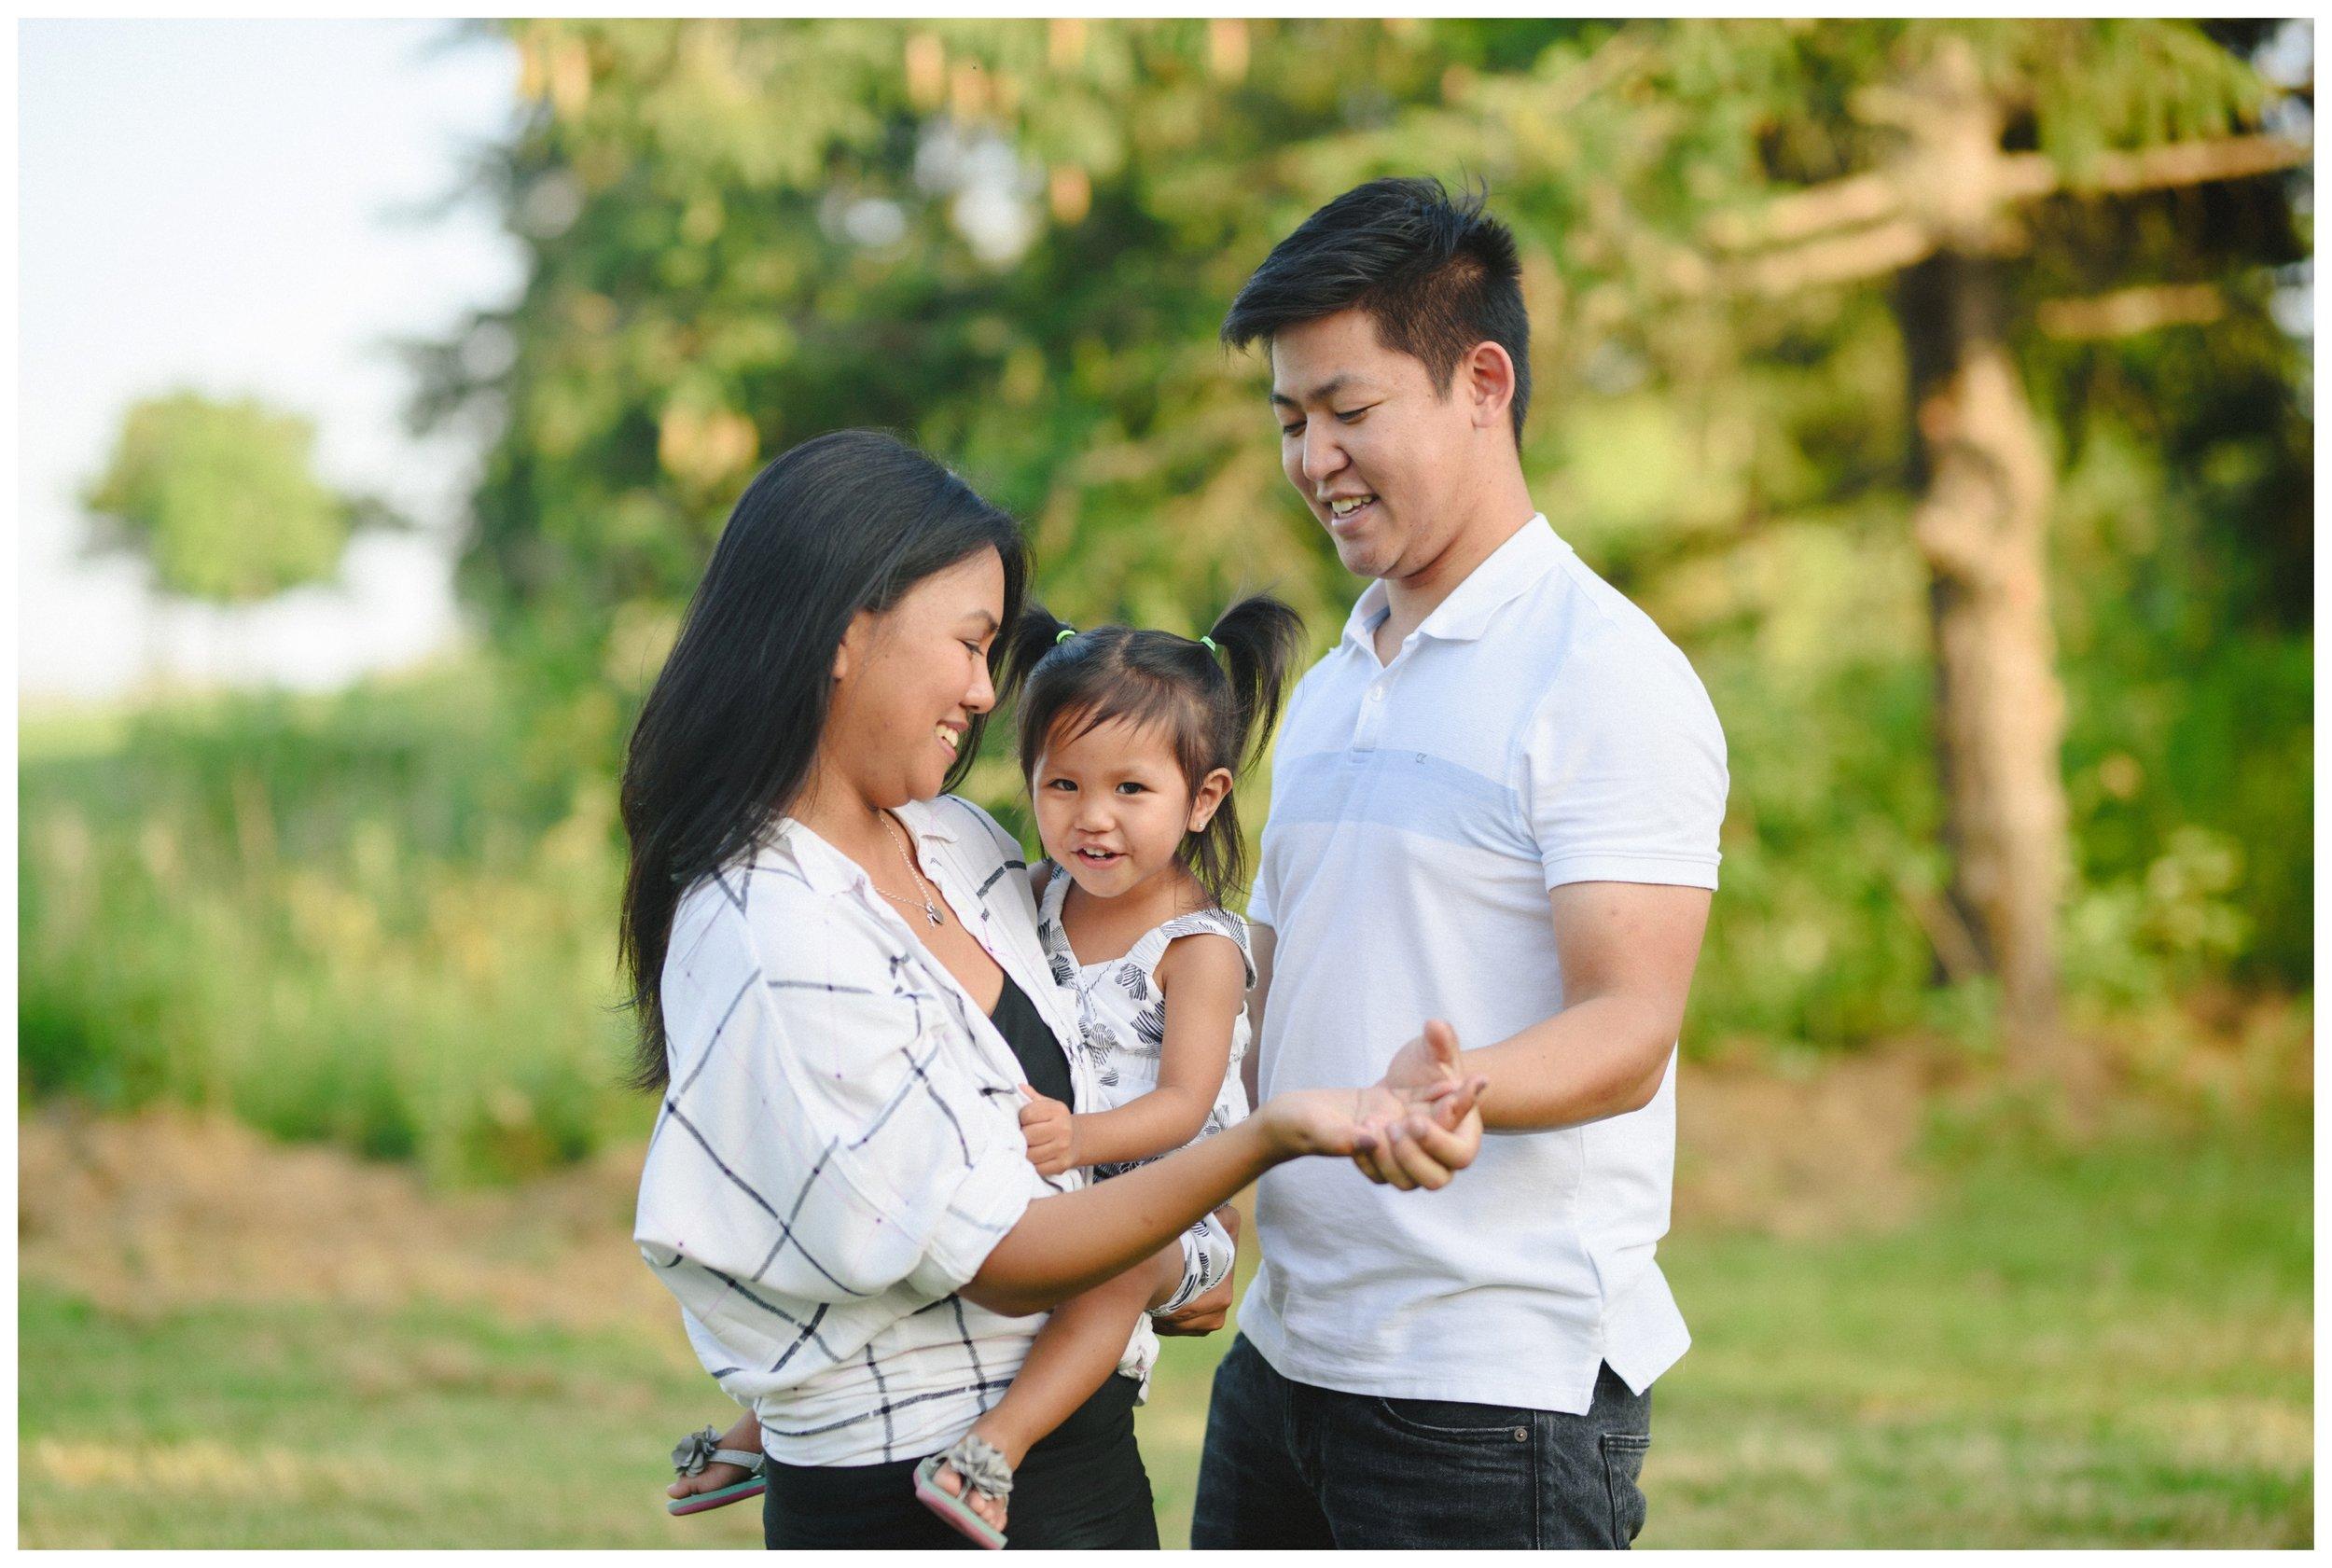 Pickering Family Photography